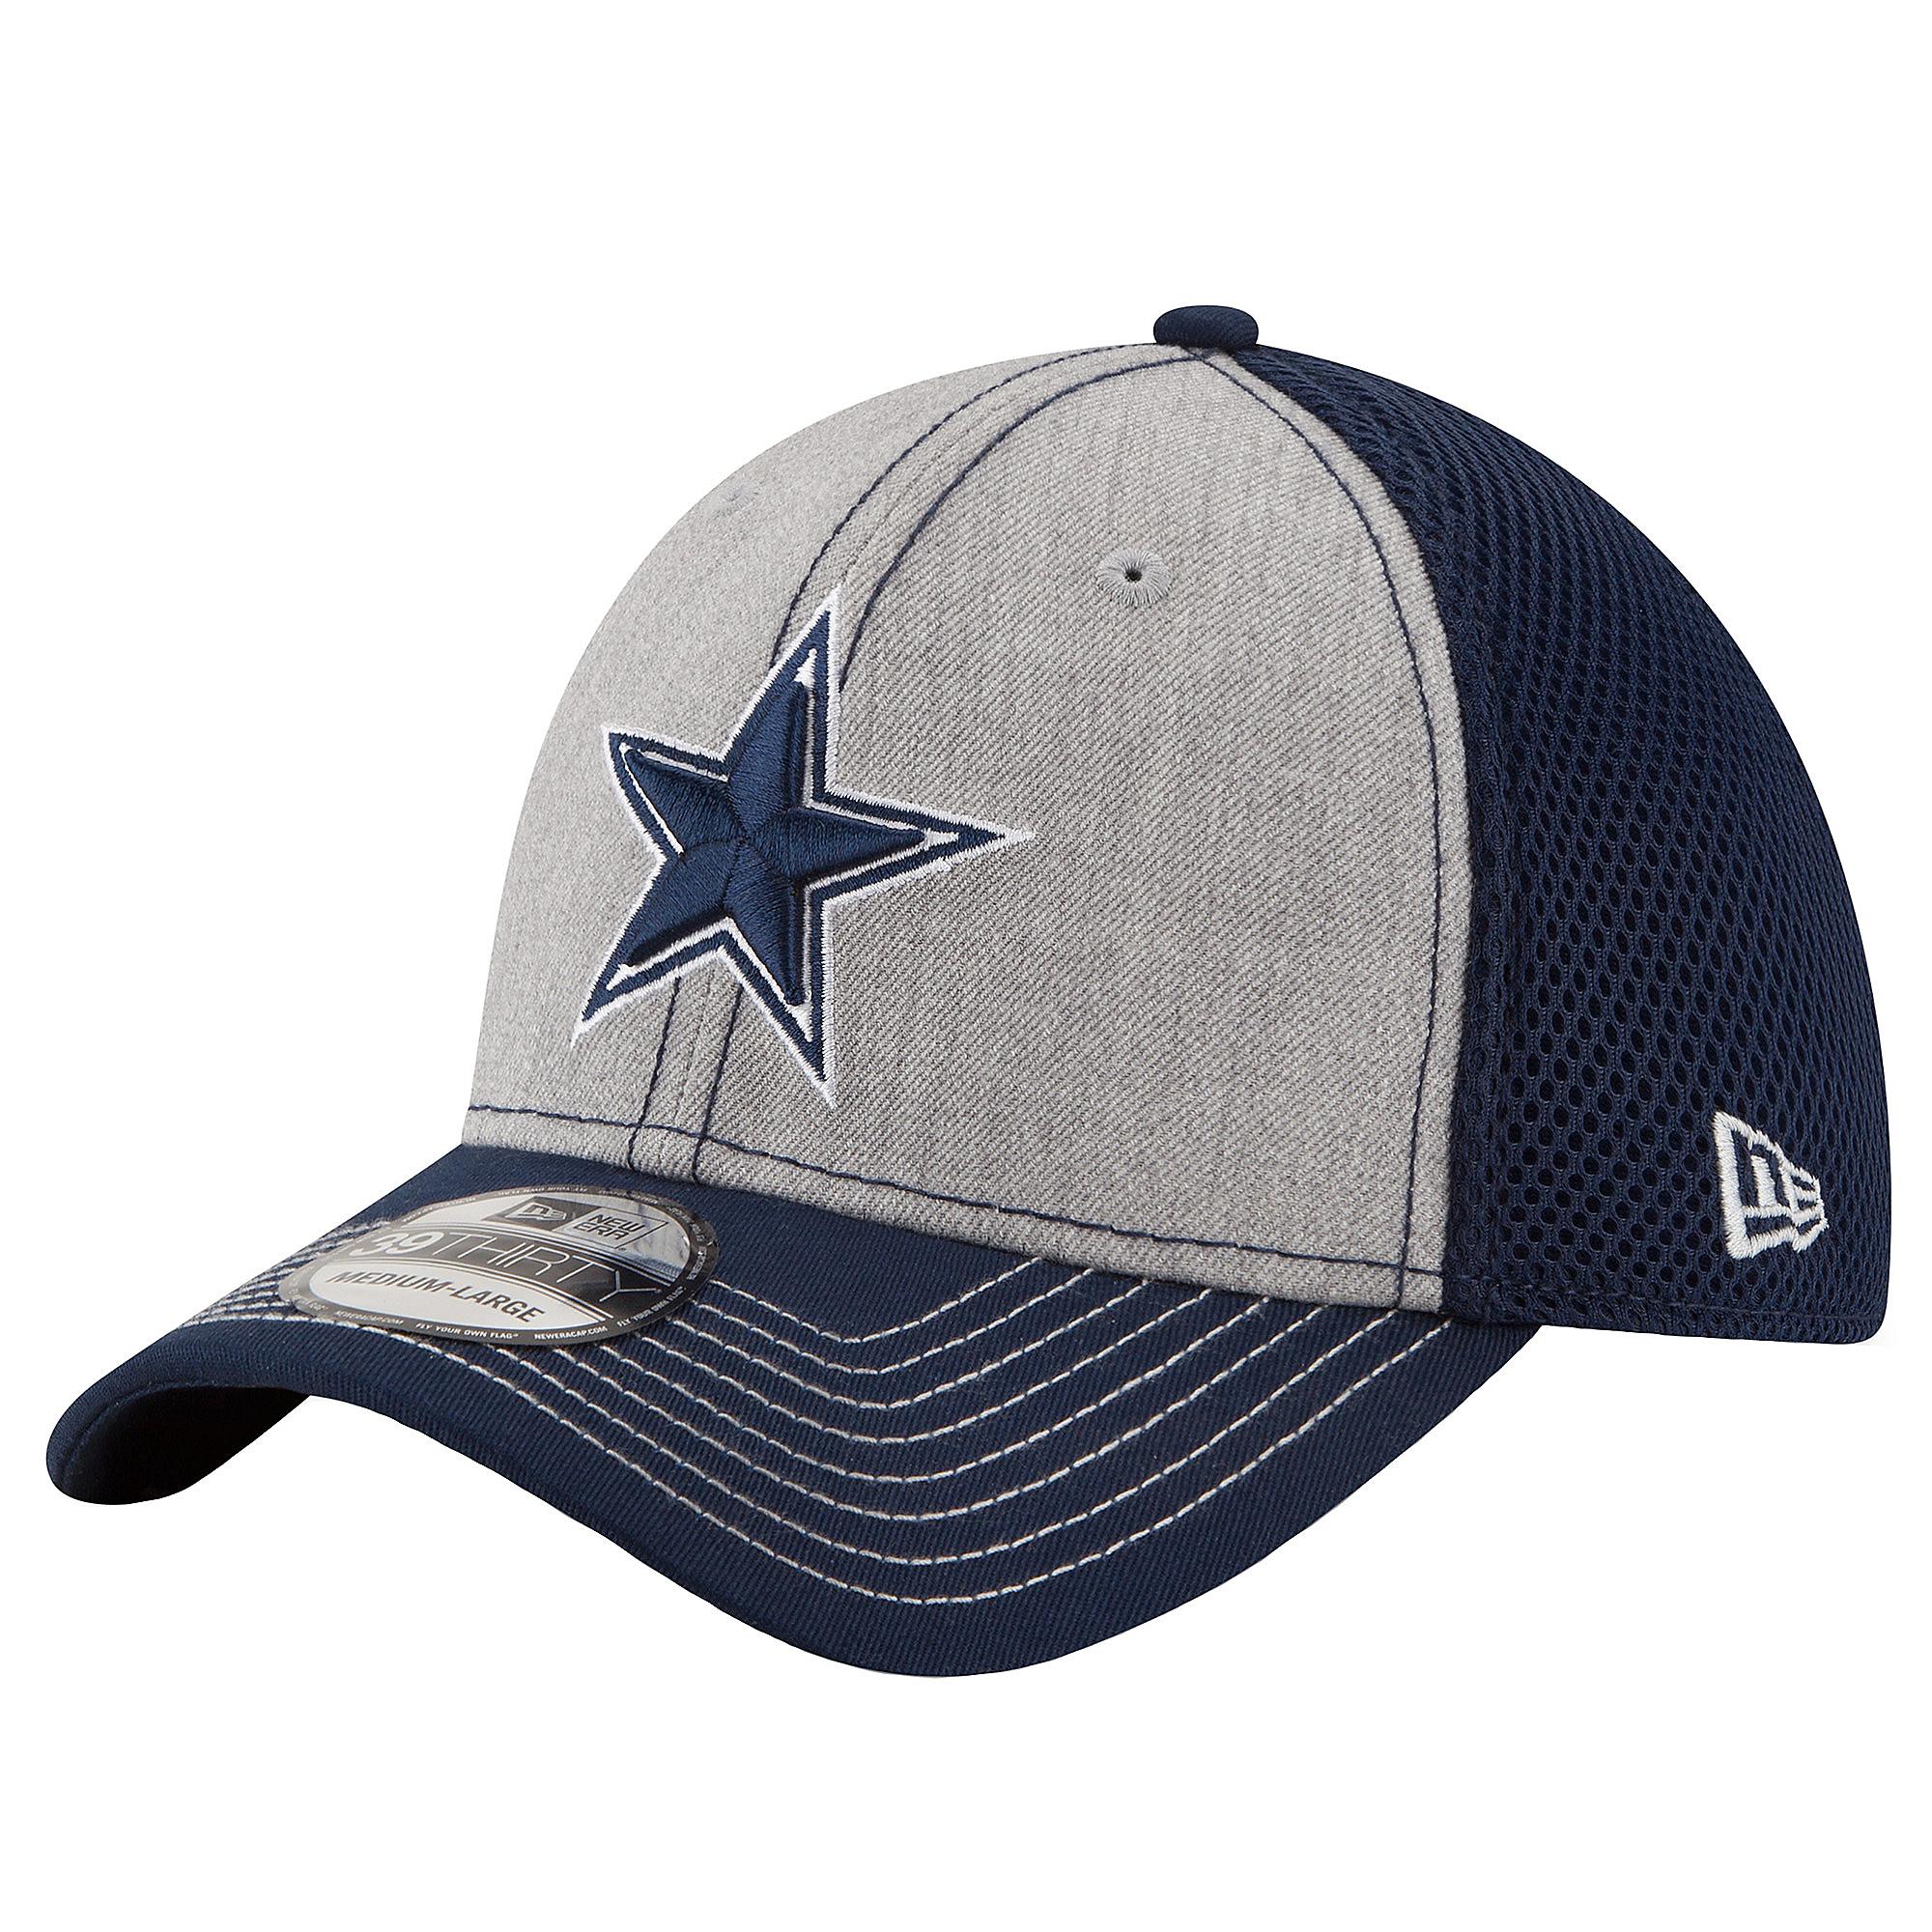 size 40 548e8 2fcd1 ... where to buy dallas cowboys new era heathered neo 39thirty cap 8e0b4  9fb4c